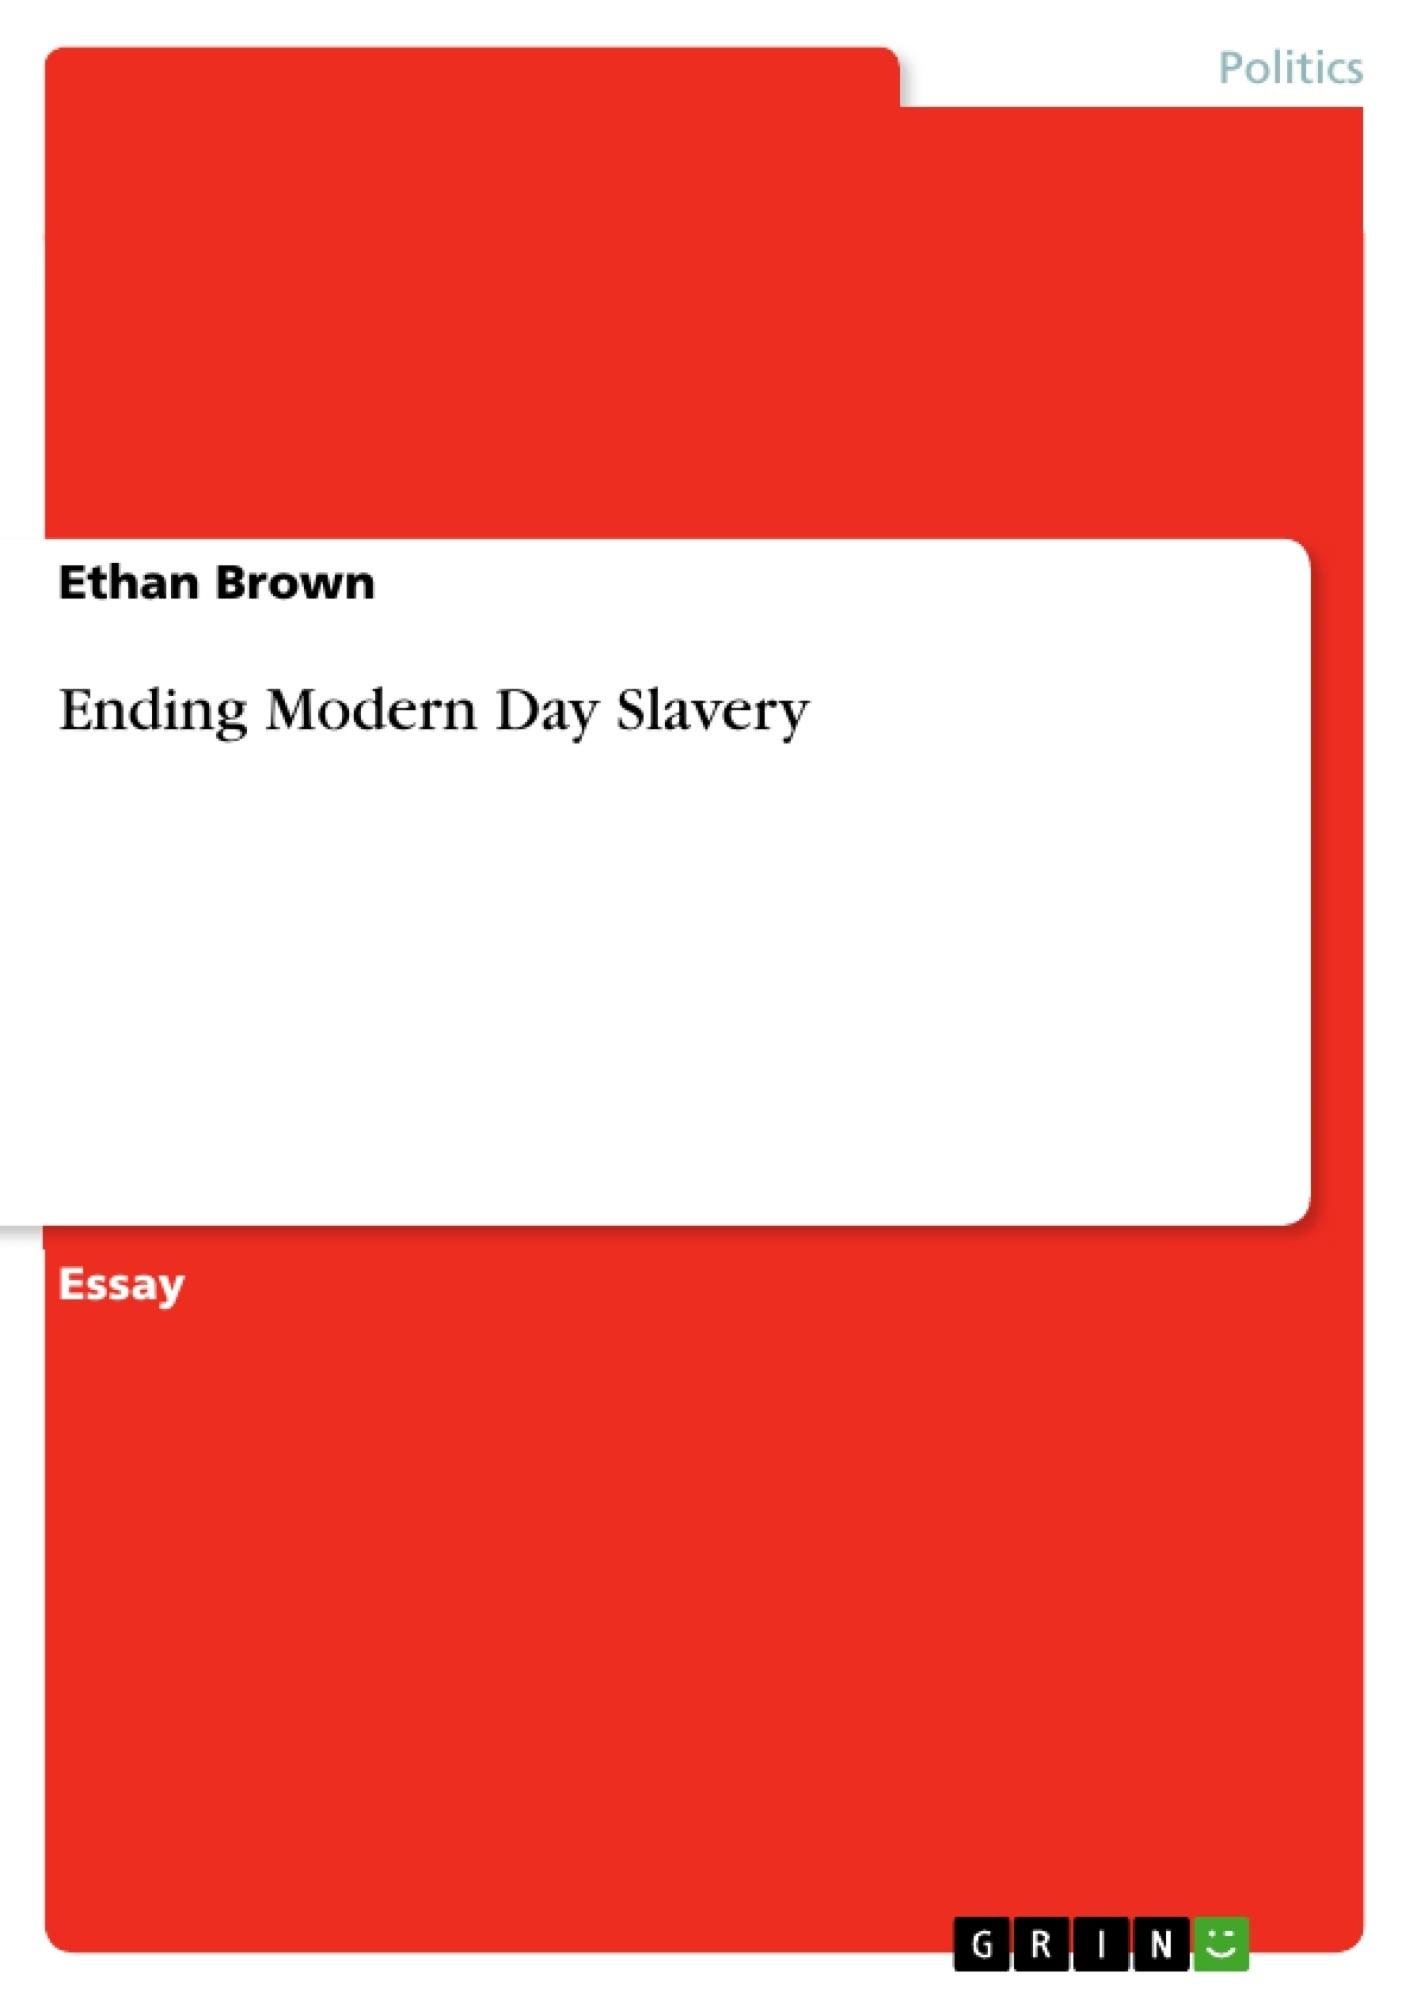 Title: Ending Modern Day Slavery